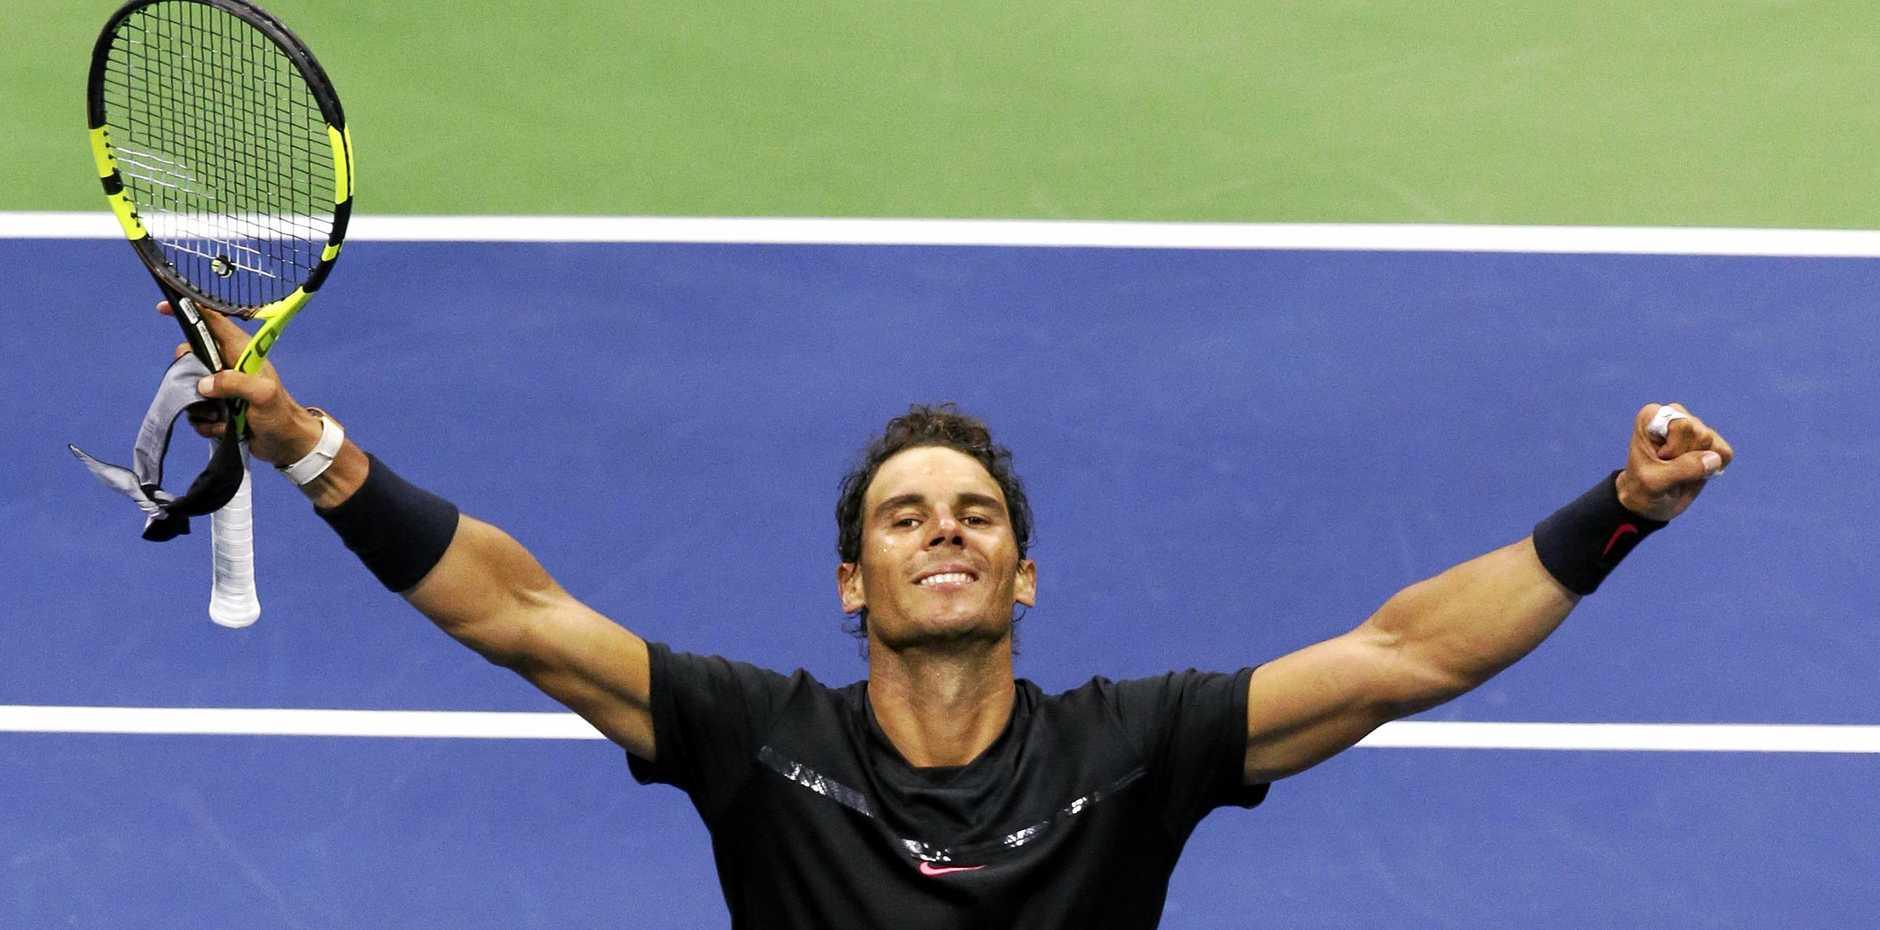 Rafael Nadal, of Spain, raises his arms after defeating Taro Daniel, of Japan, at the U.S. Open.